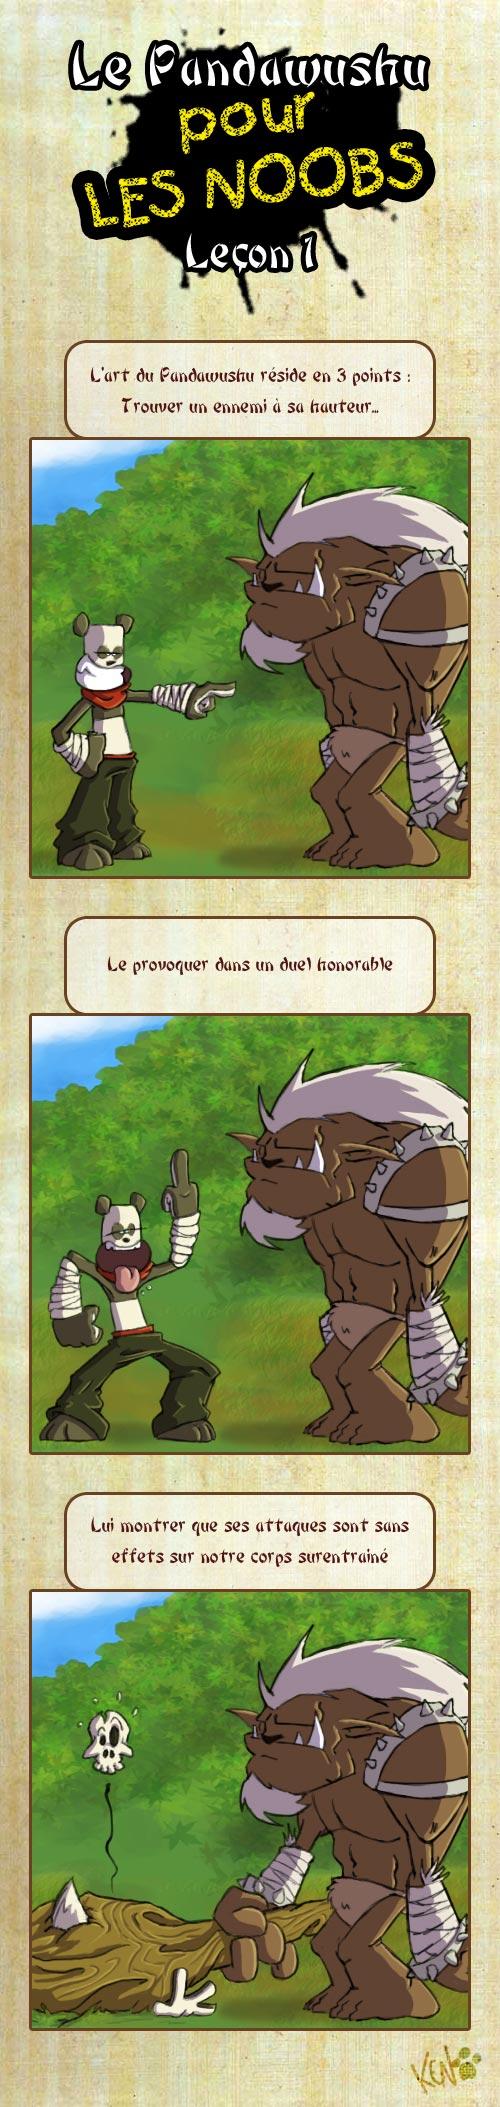 Le Pandawushu pour les Noobs Pandawushu01